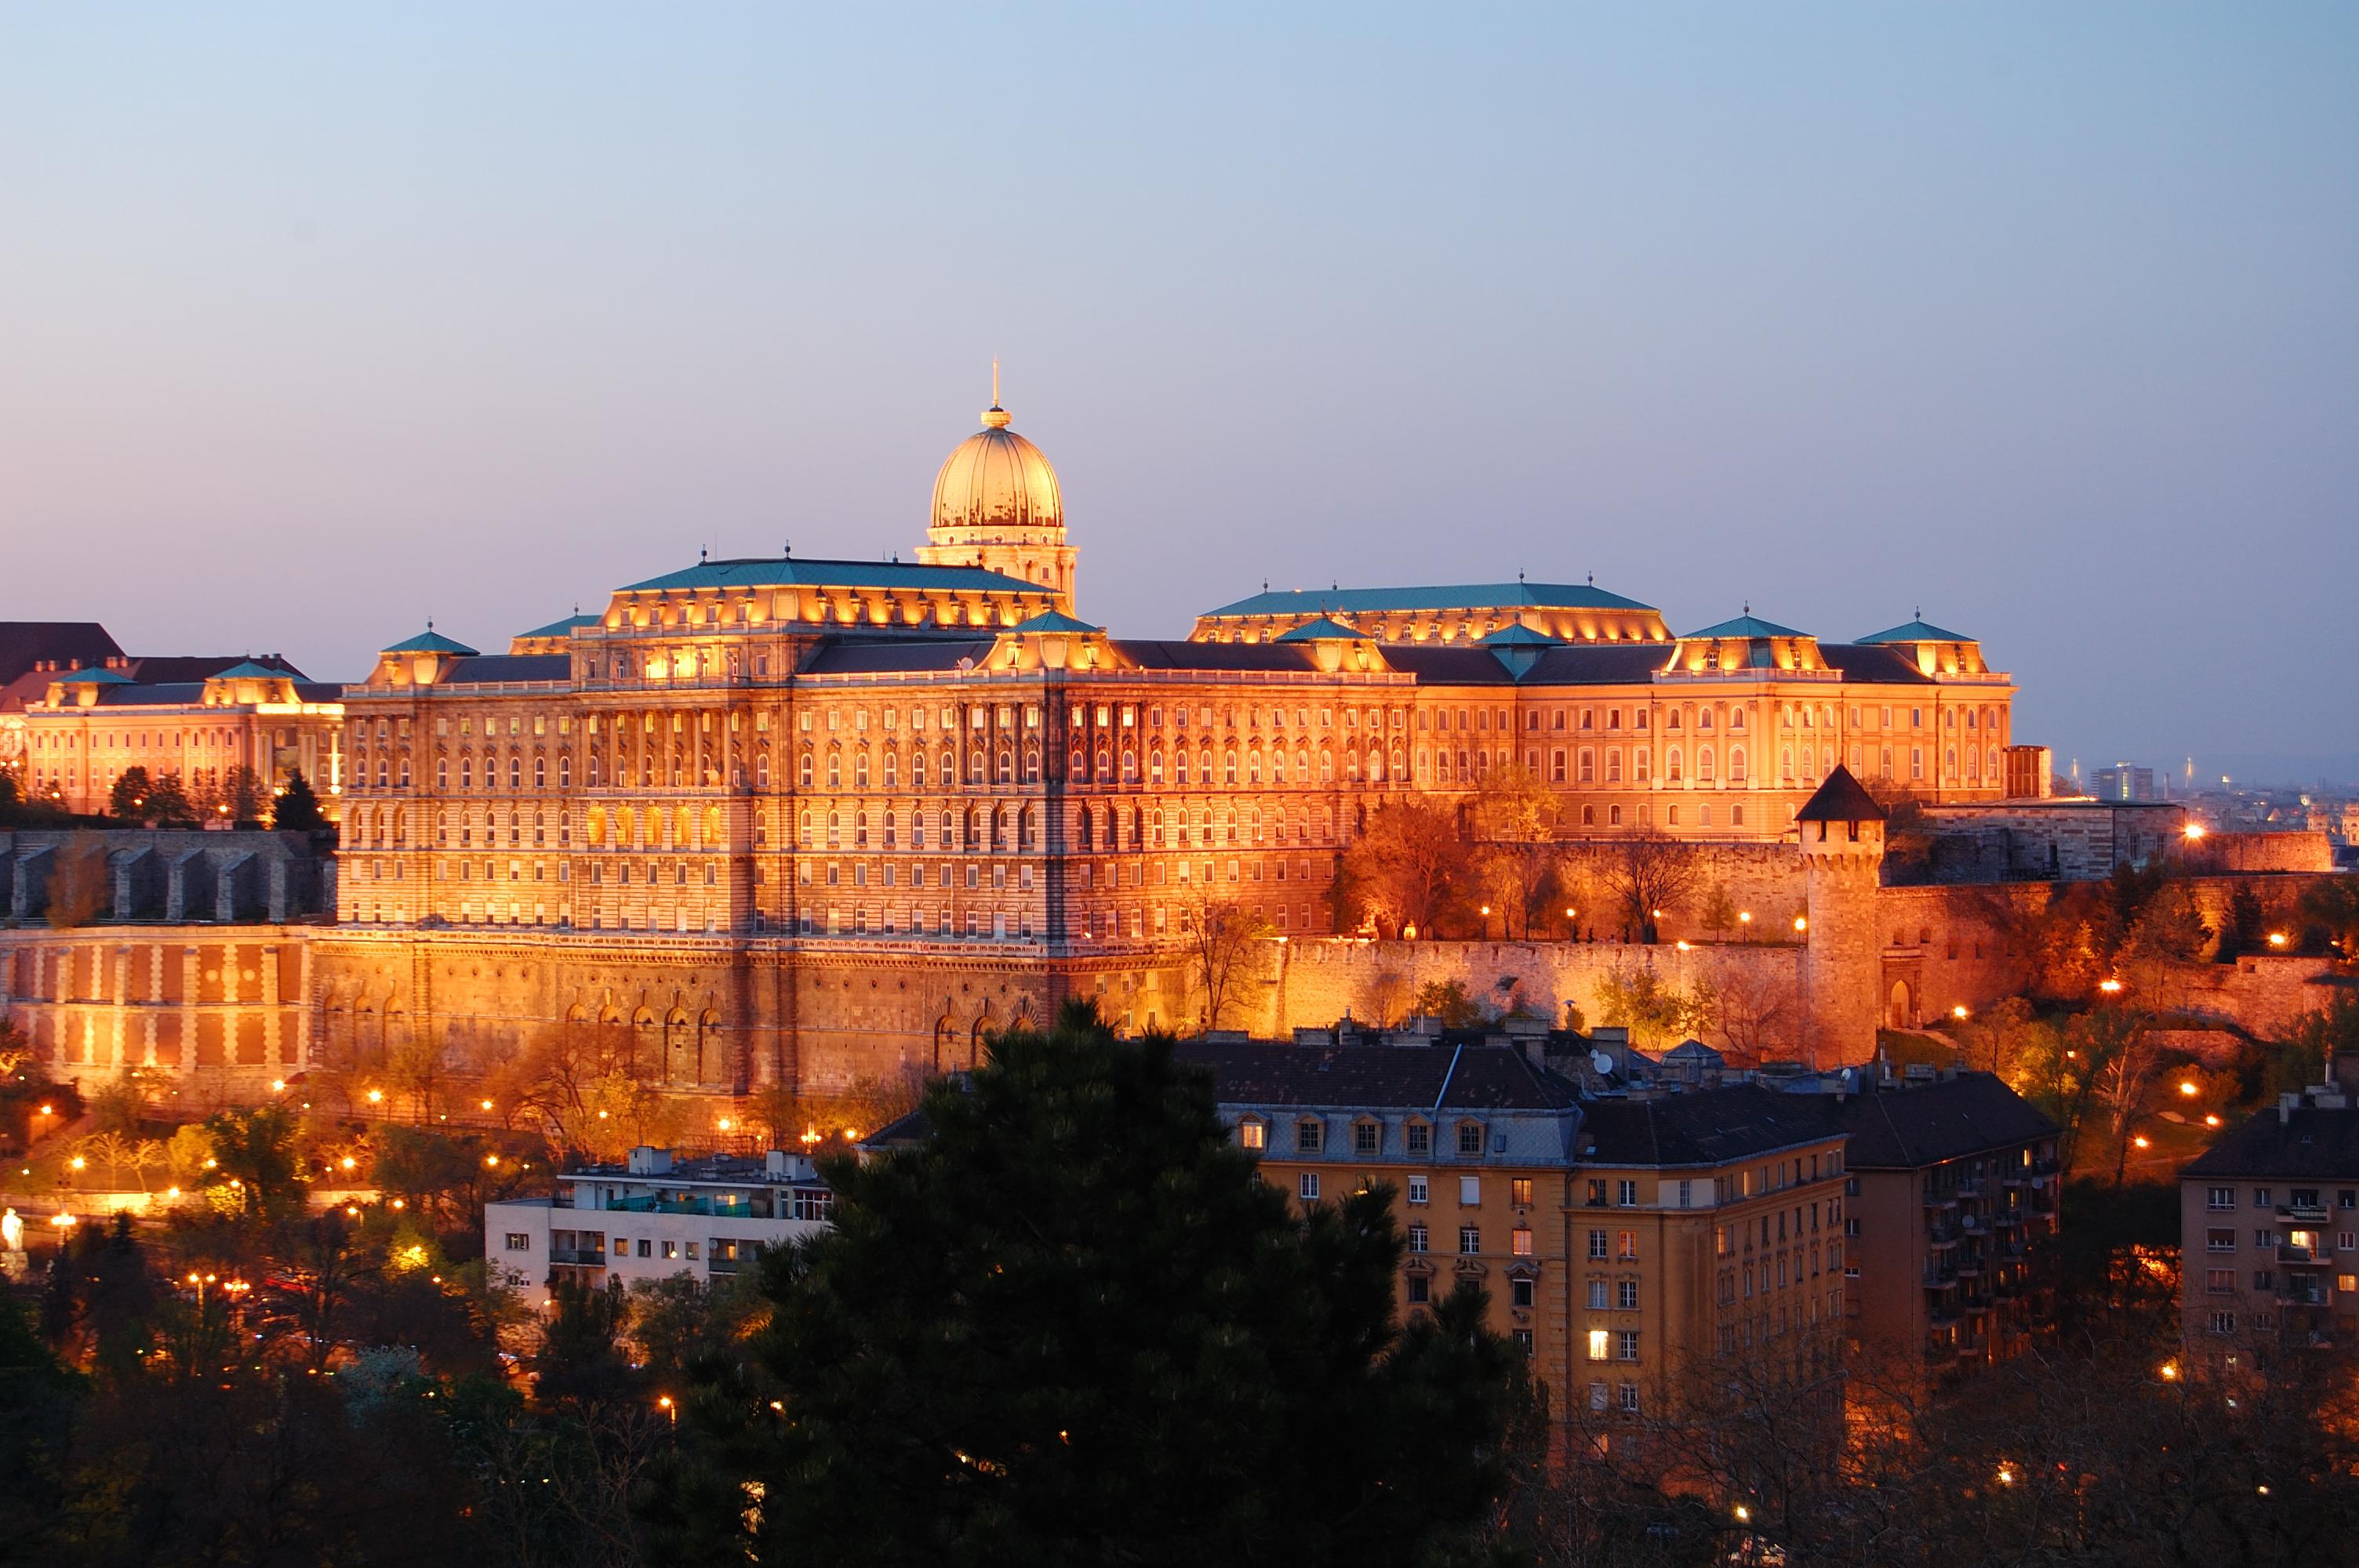 Buda_Castle_Evening_2010